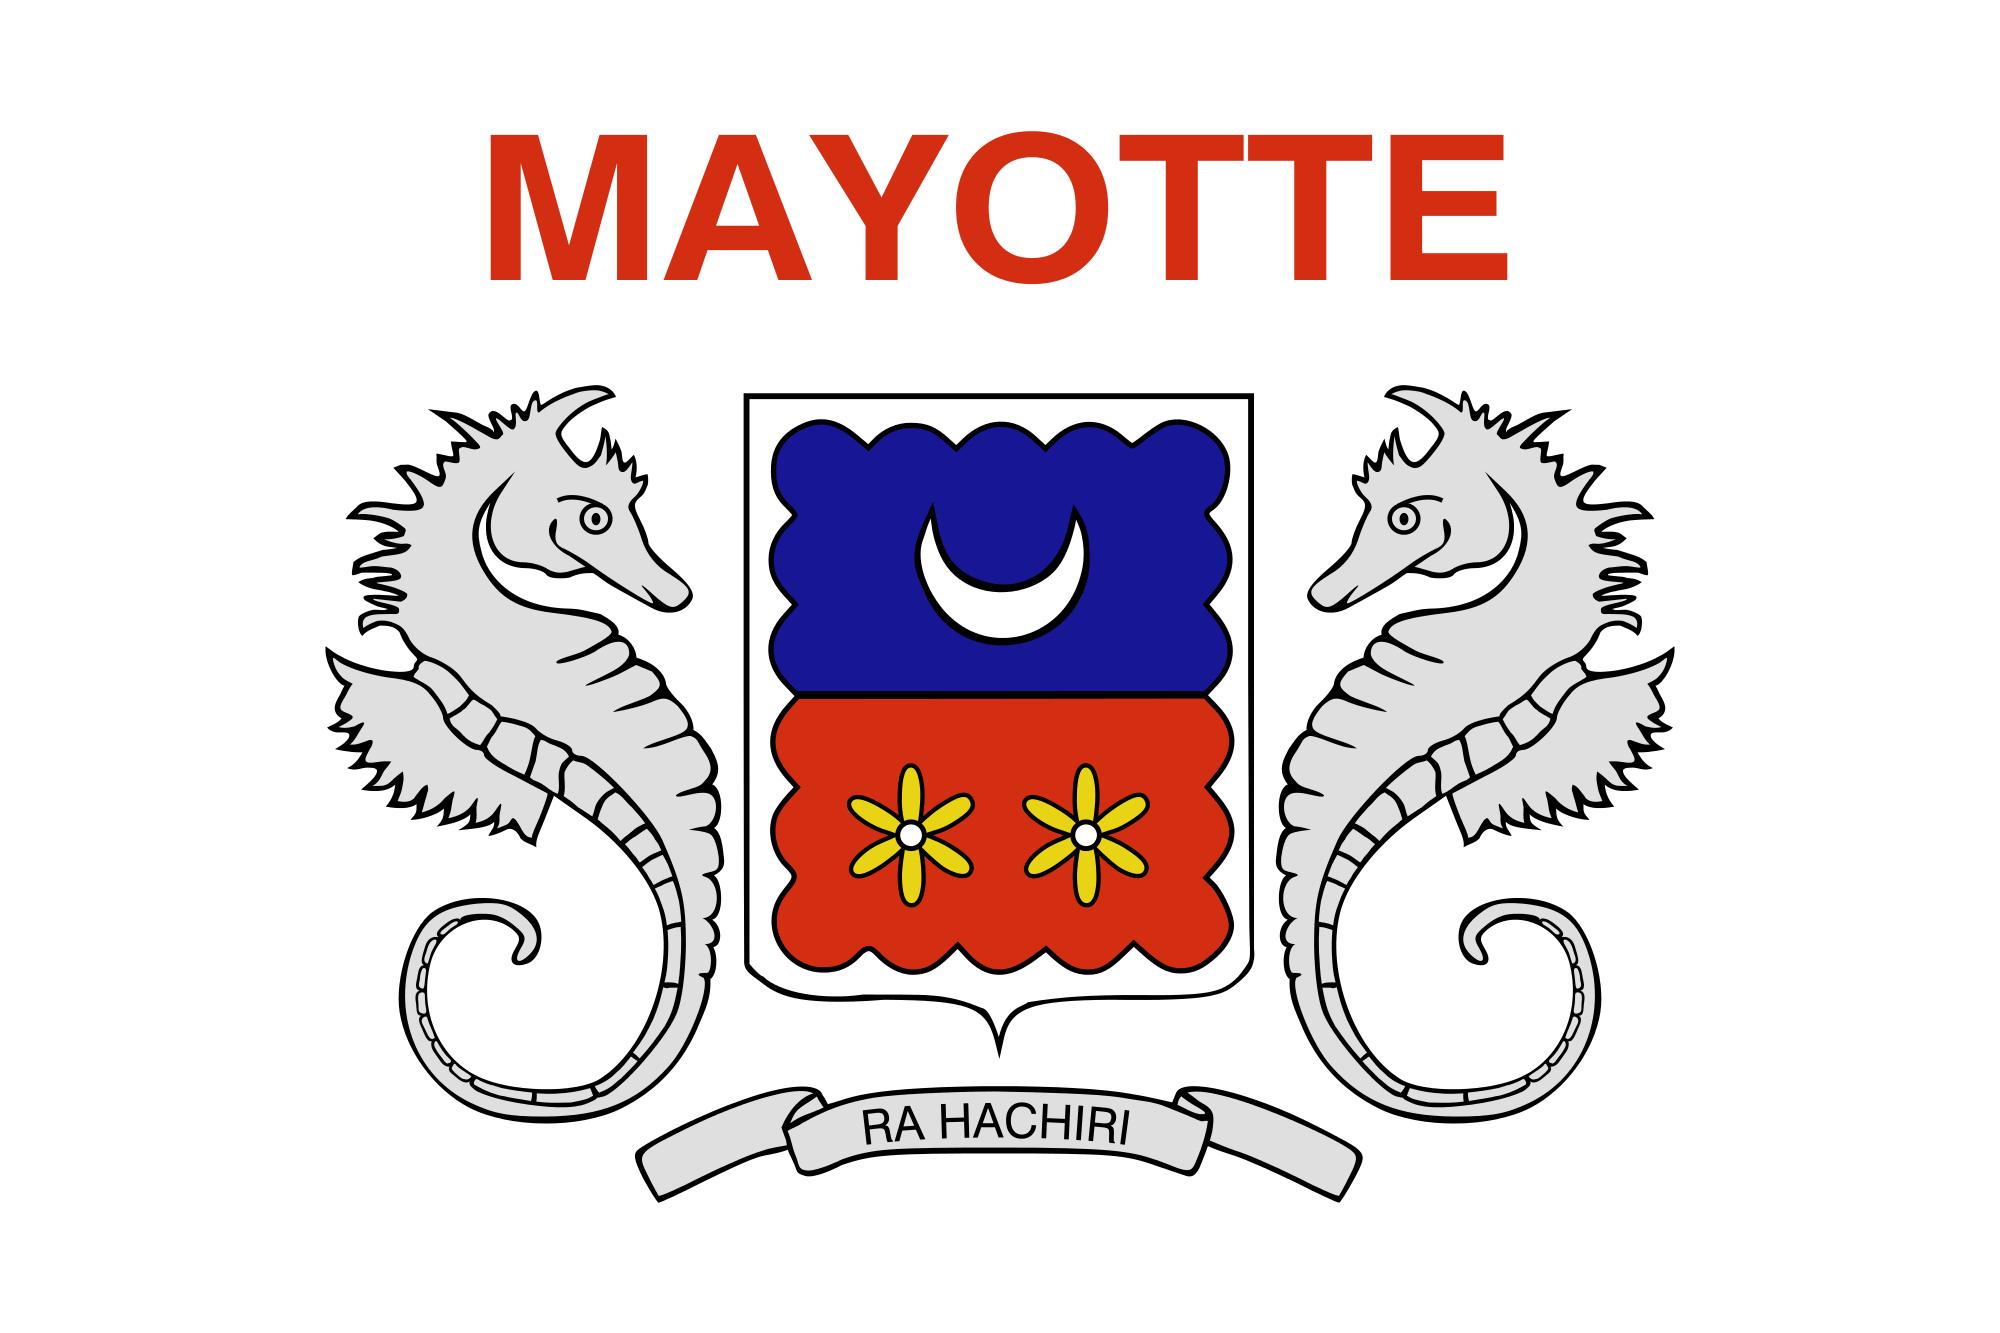 mayotte, país, emblema, insignia, σύμβολο - Wallpapers HD - Professor-falken.com